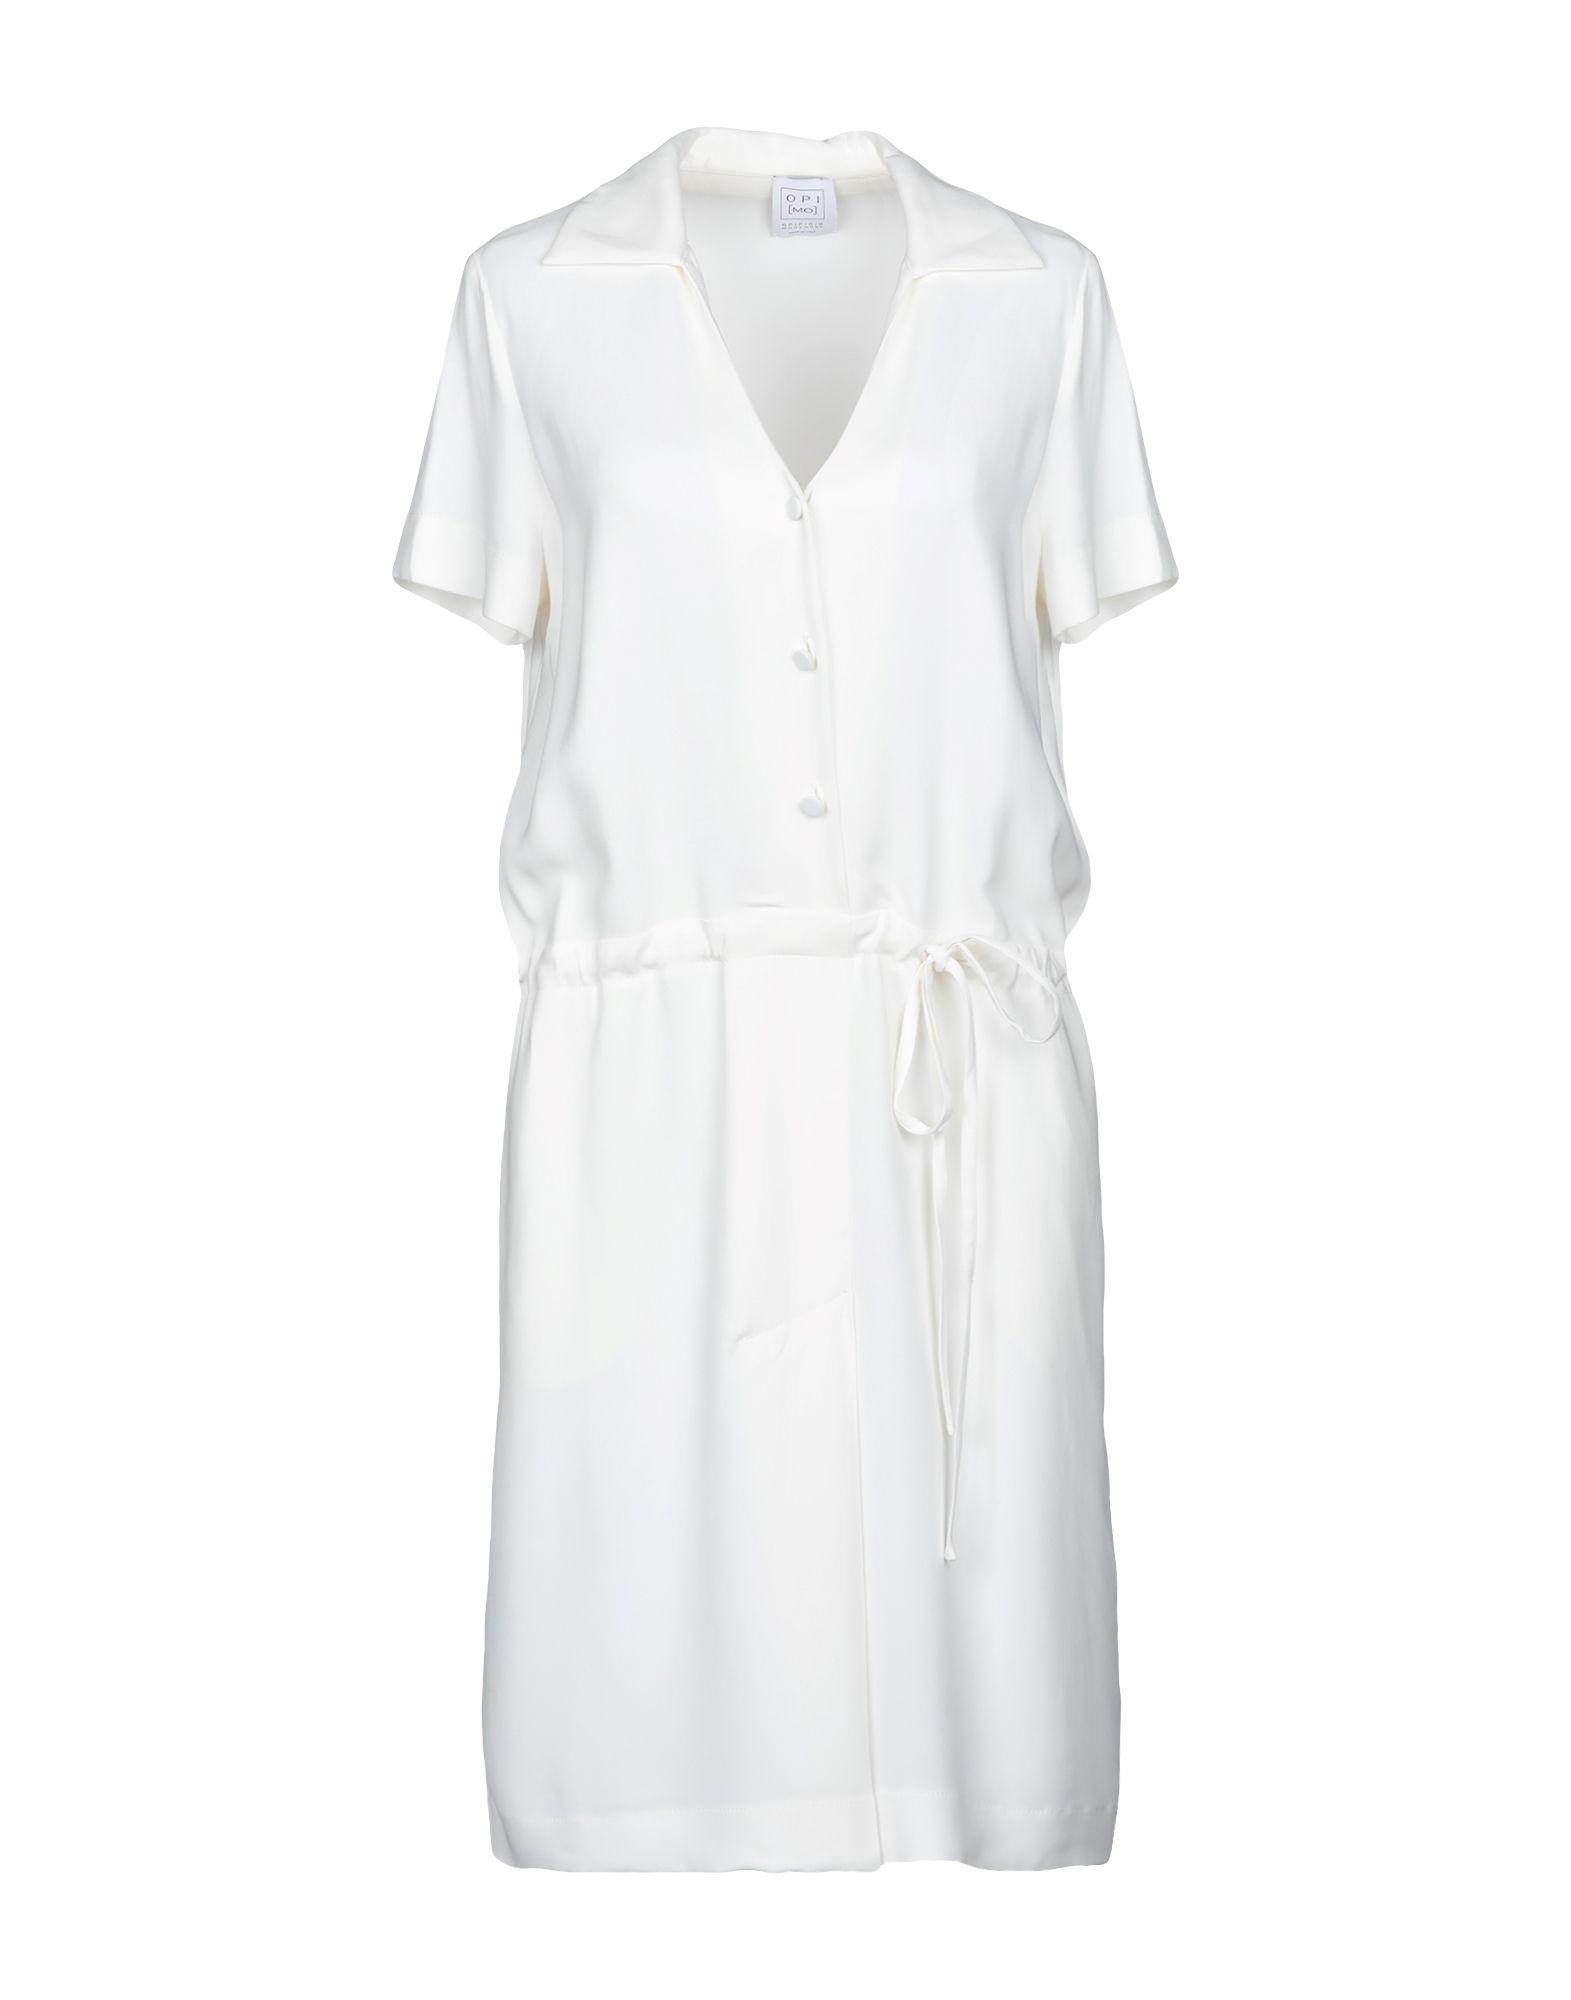 Фото - OPI [MO] Короткое платье кпб mo 21